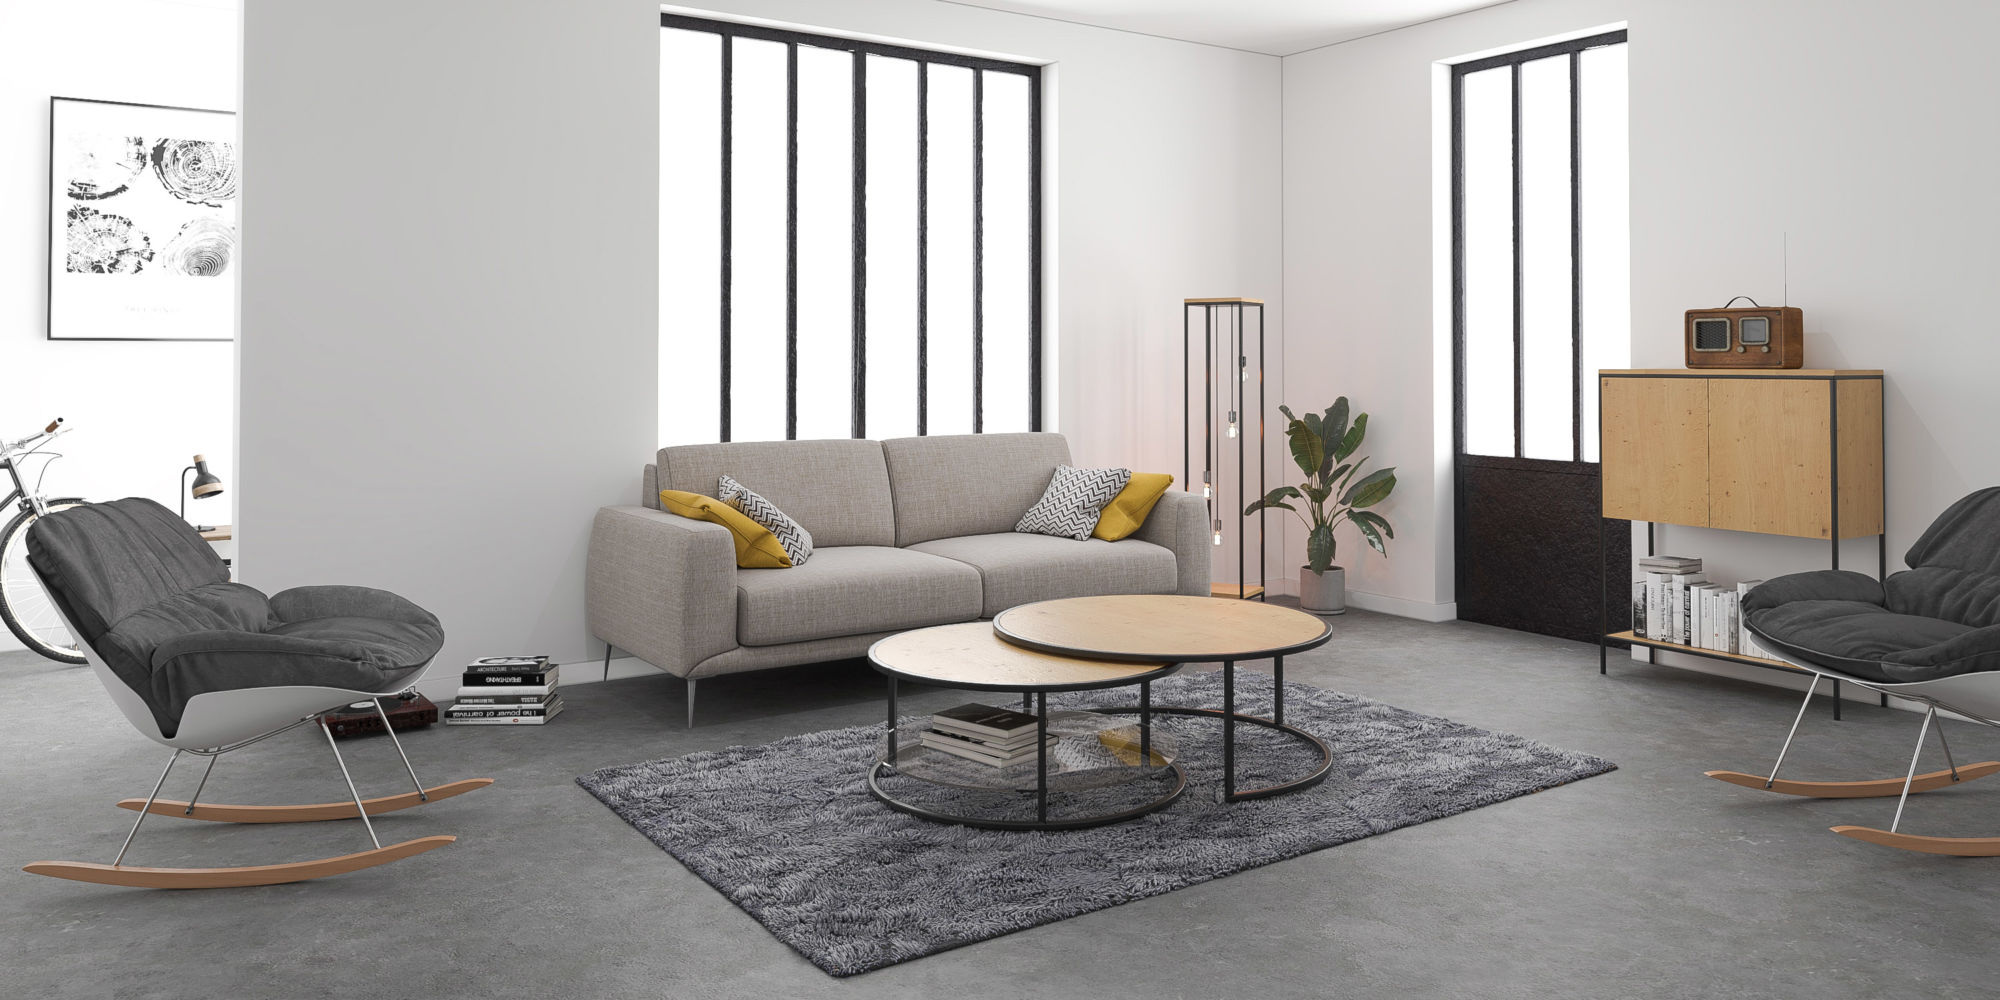 Wood métal furniture